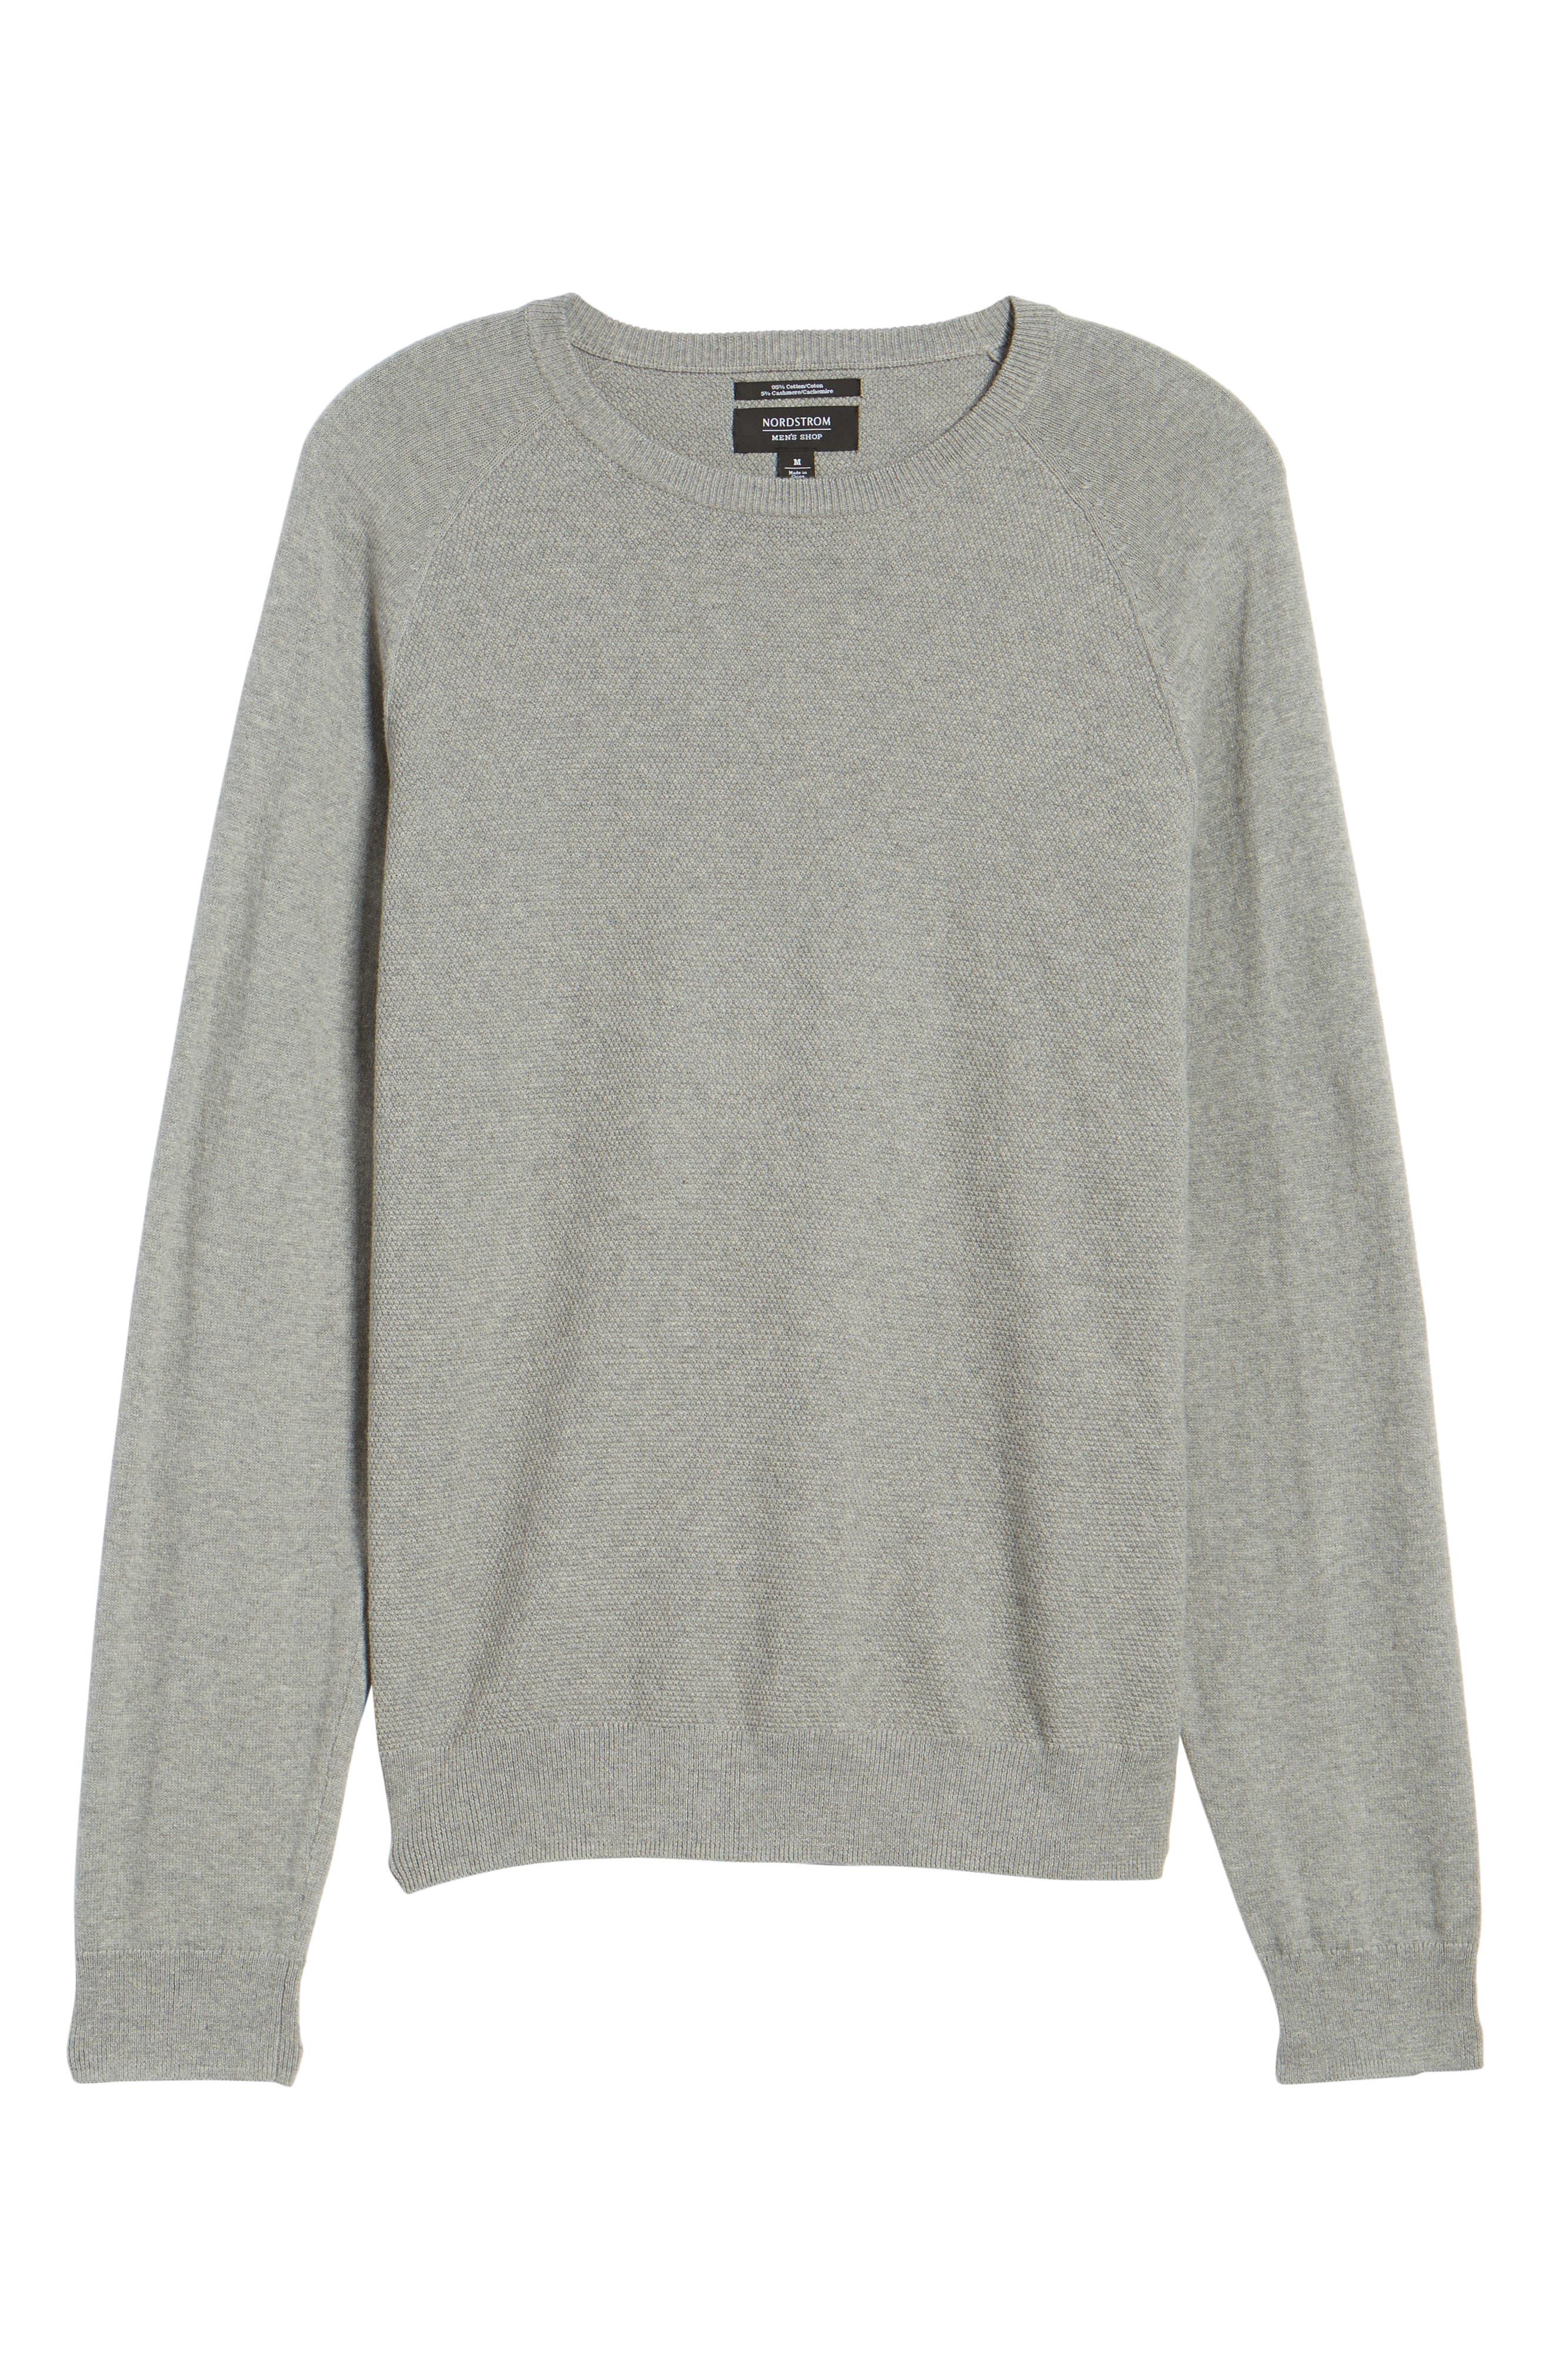 Crewneck Cotton & Cashmere Sweater,                             Alternate thumbnail 6, color,                             Grey Medium Heather